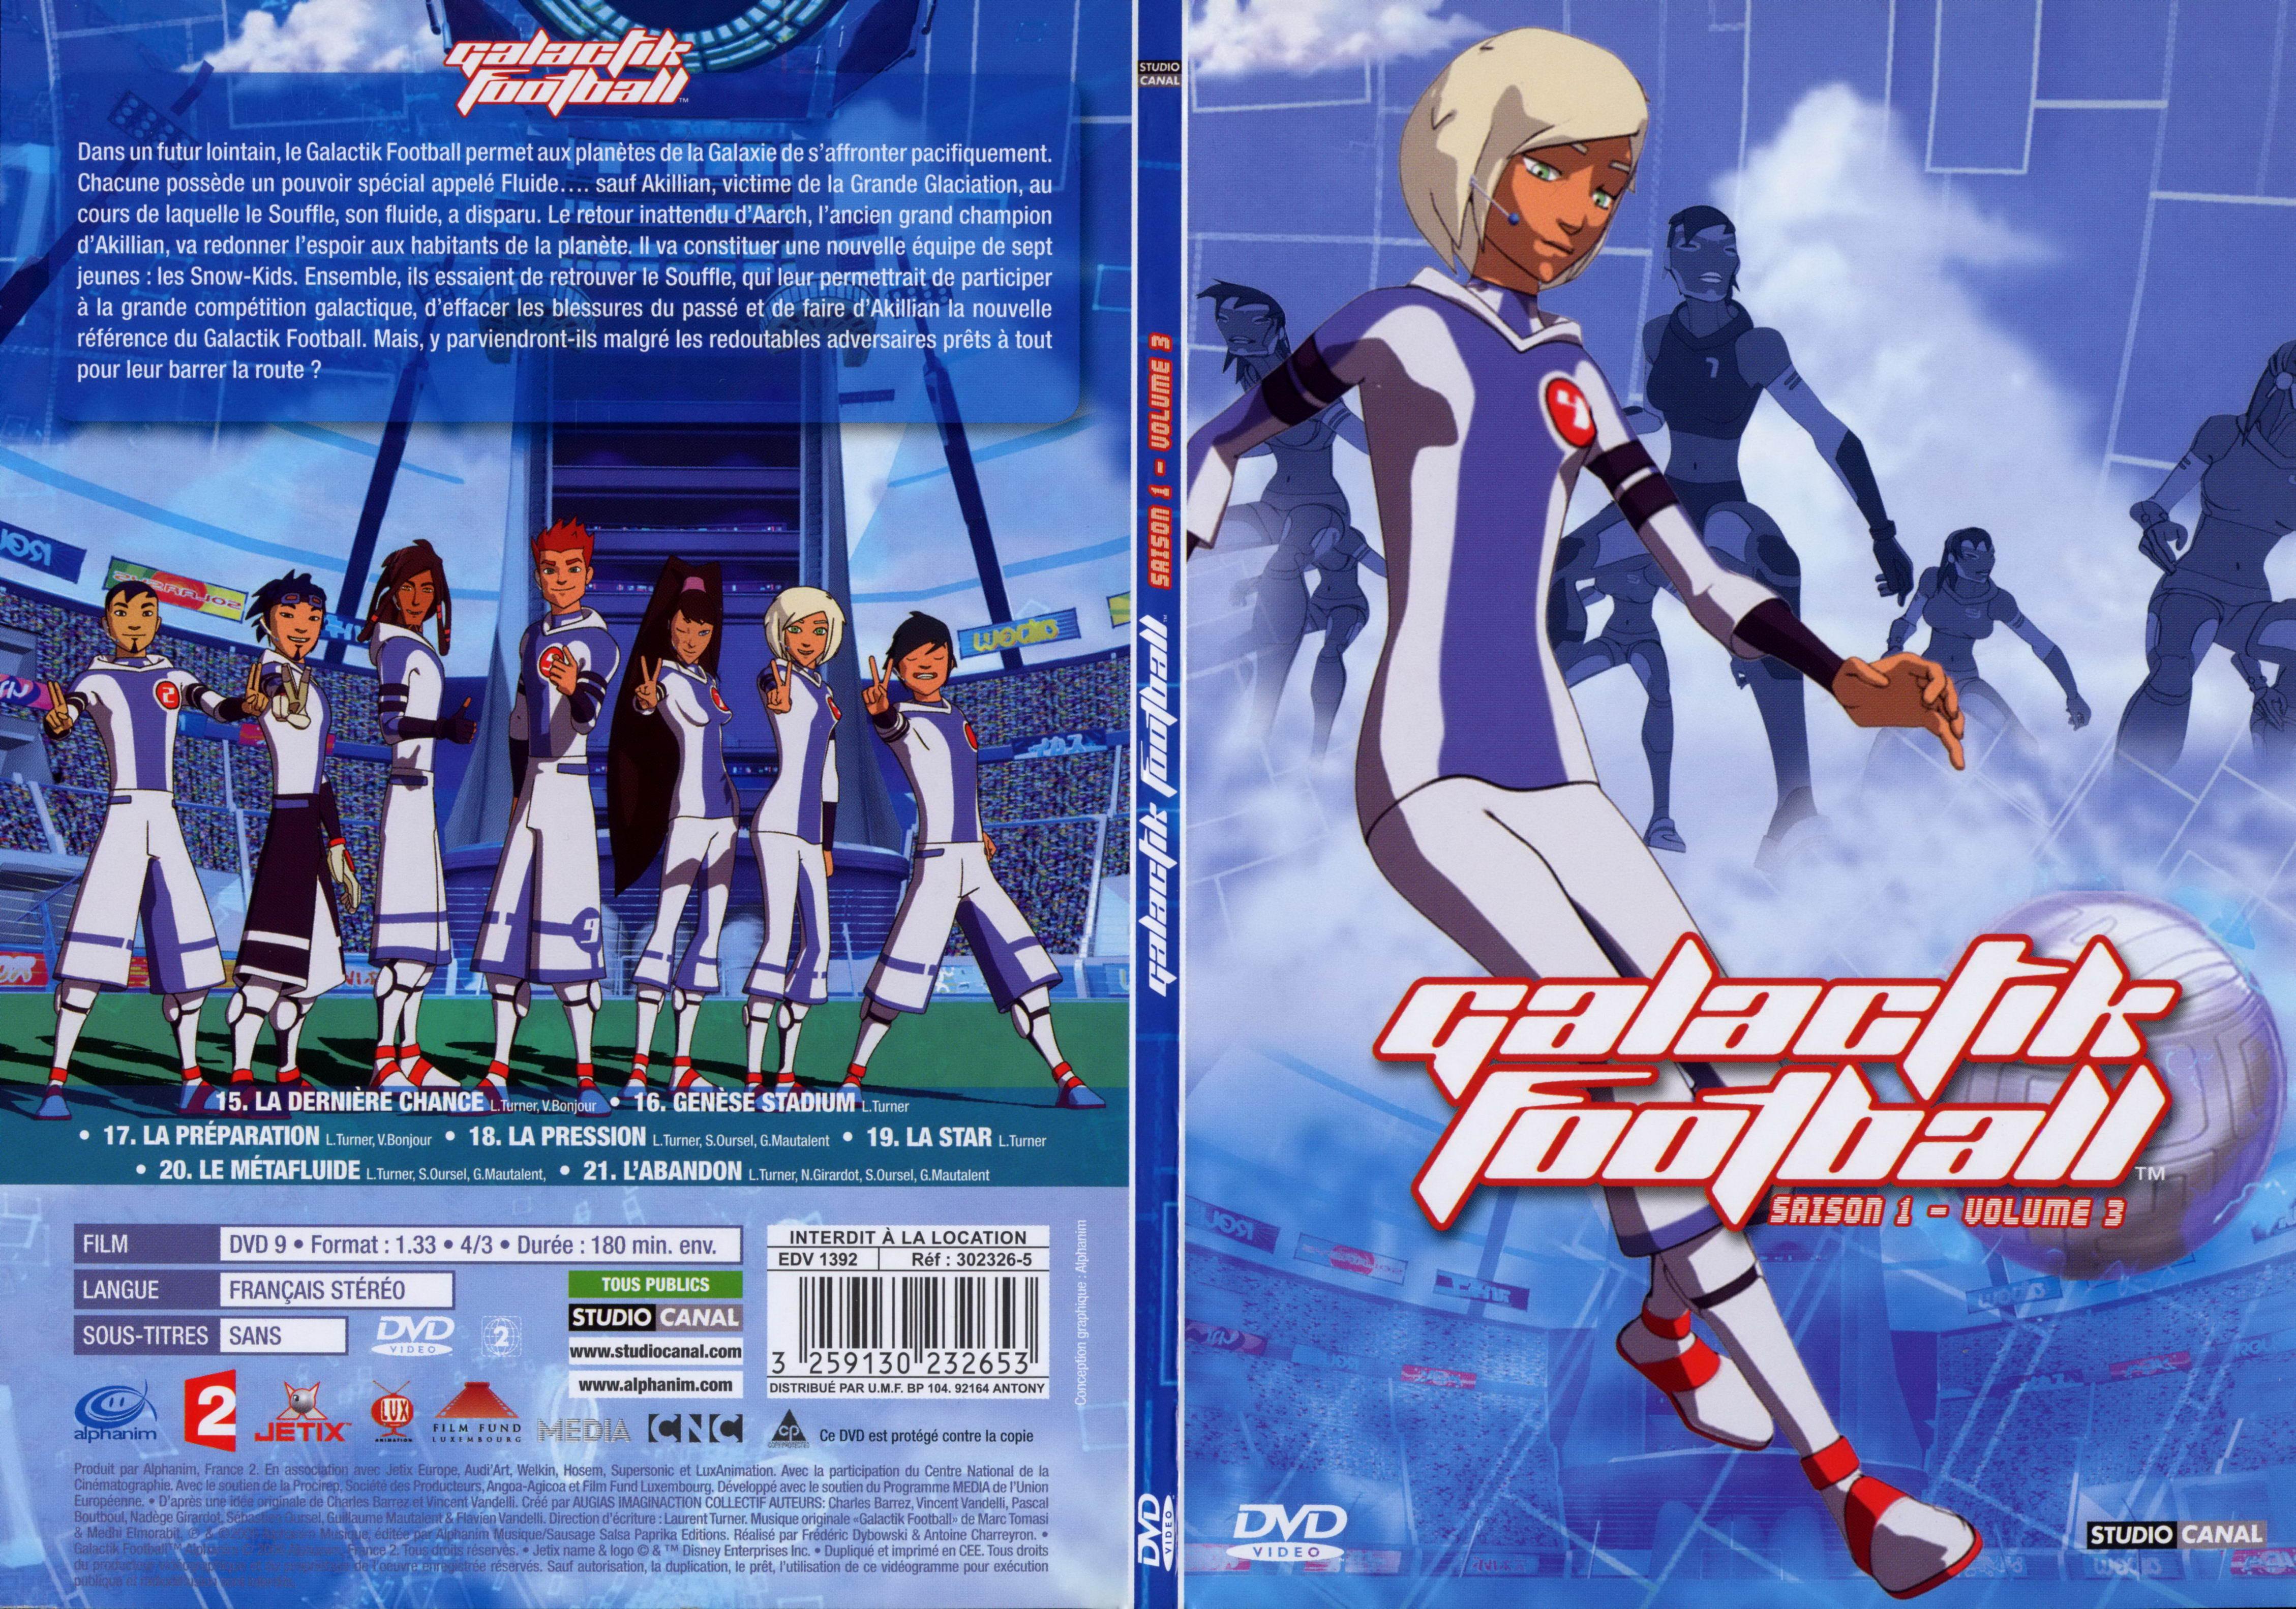 Galactik football saison 3 episode 4 wat potty training schedule puppy cheap soccer training shoes - Saison 4 galactik football ...